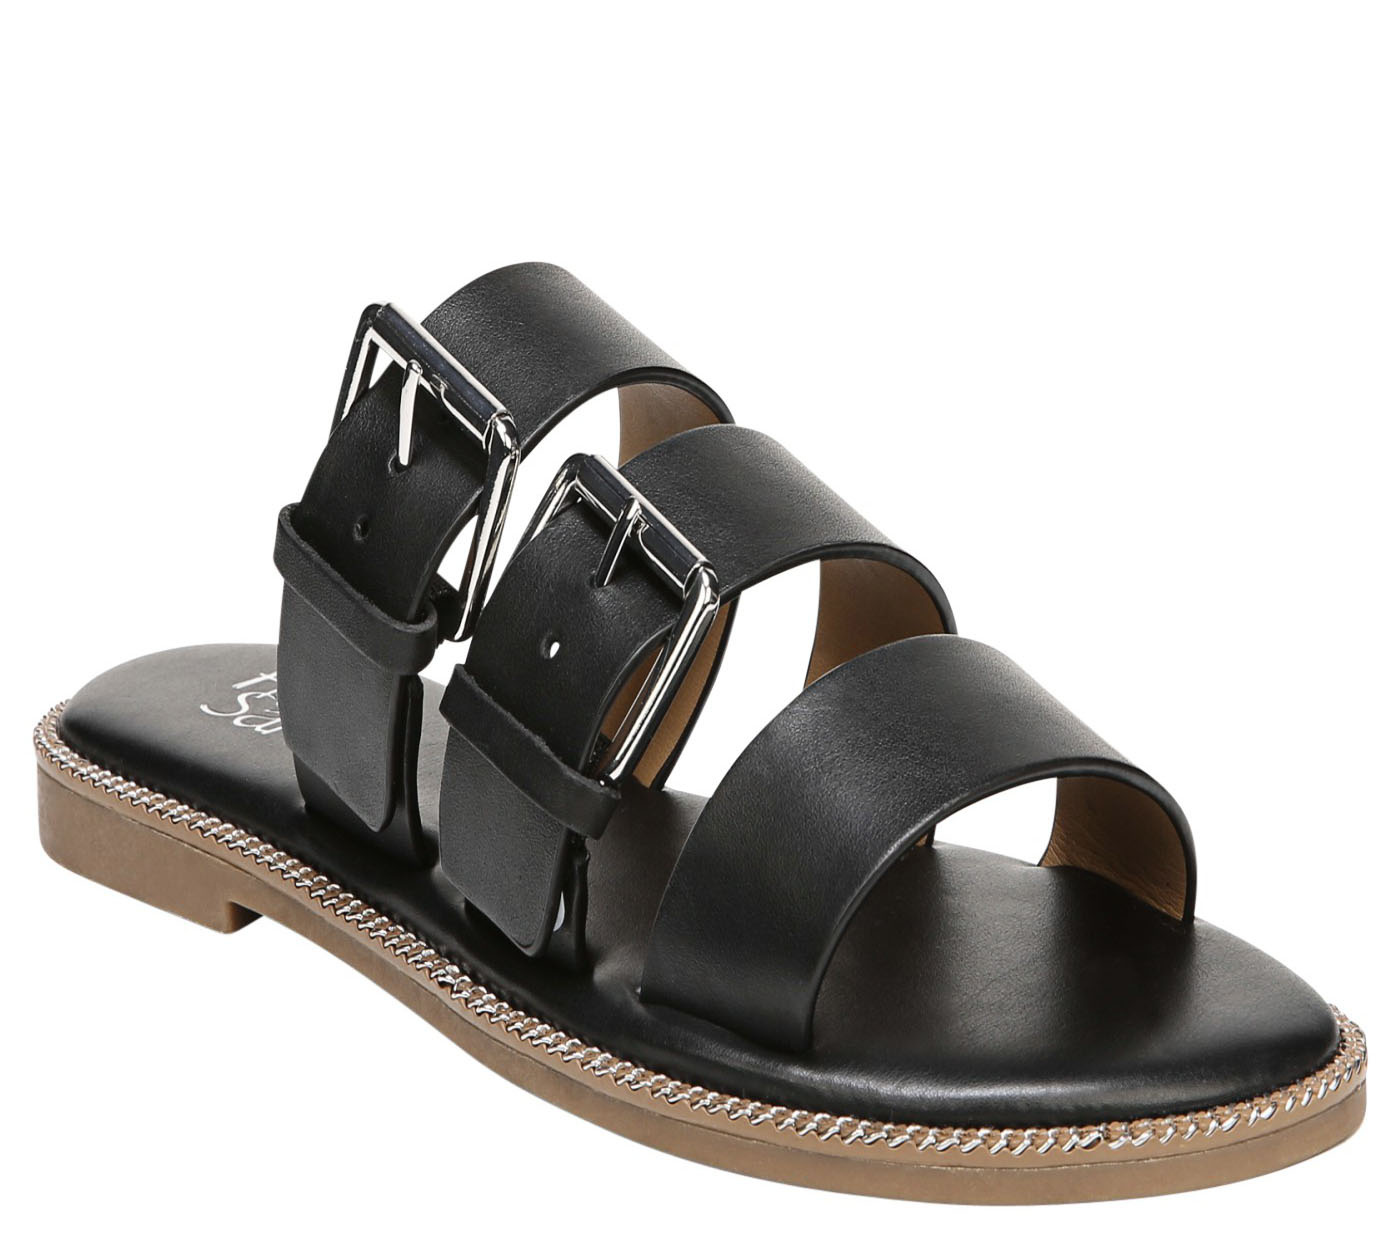 Franco Sarto Kasa Leather Buckle Slides